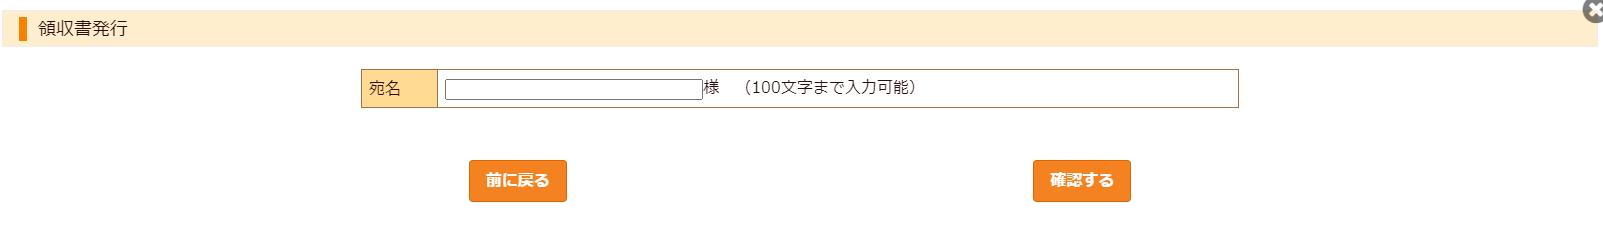 image_2021_7_27 (2).png